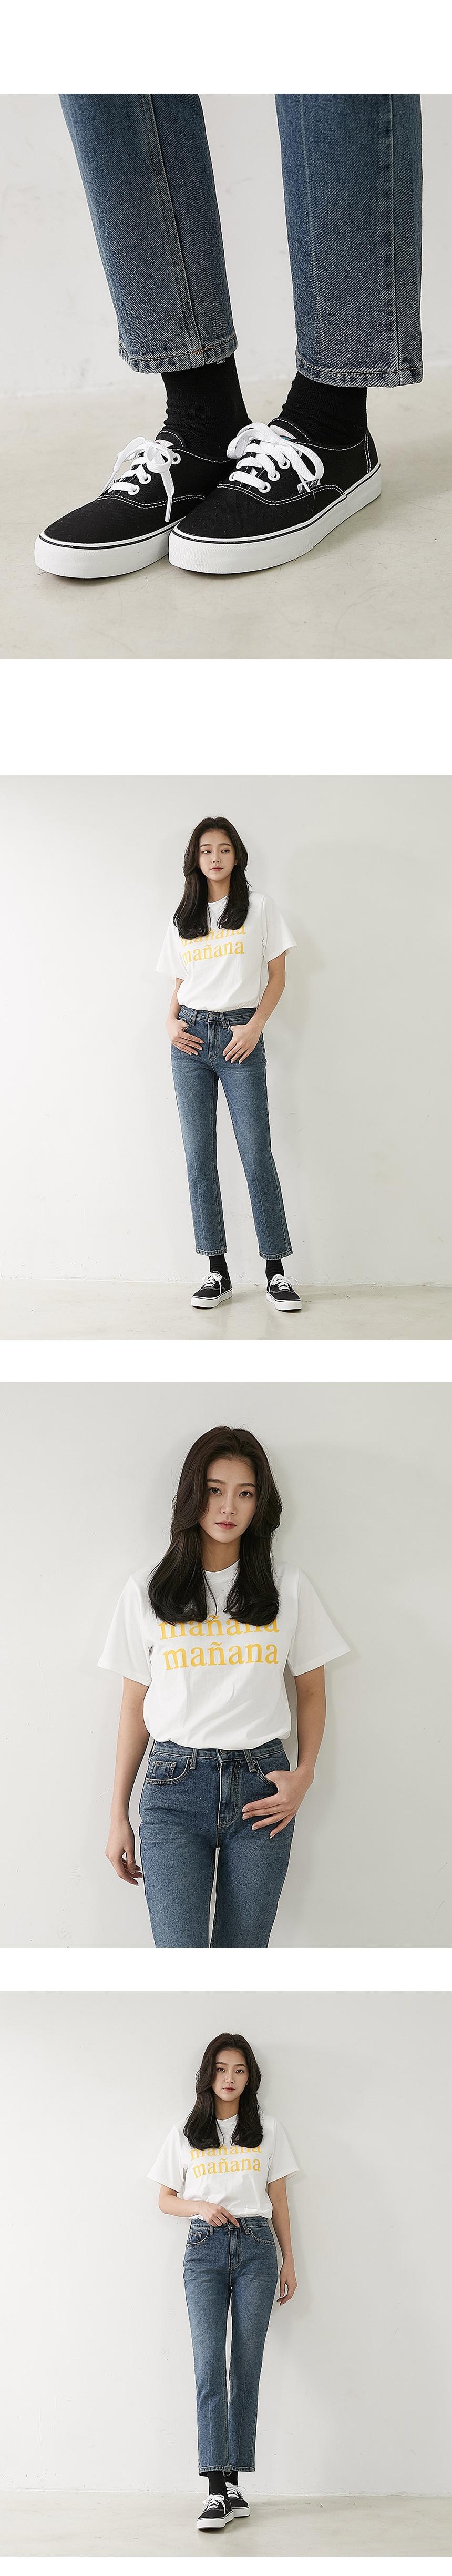 Amber denim pants